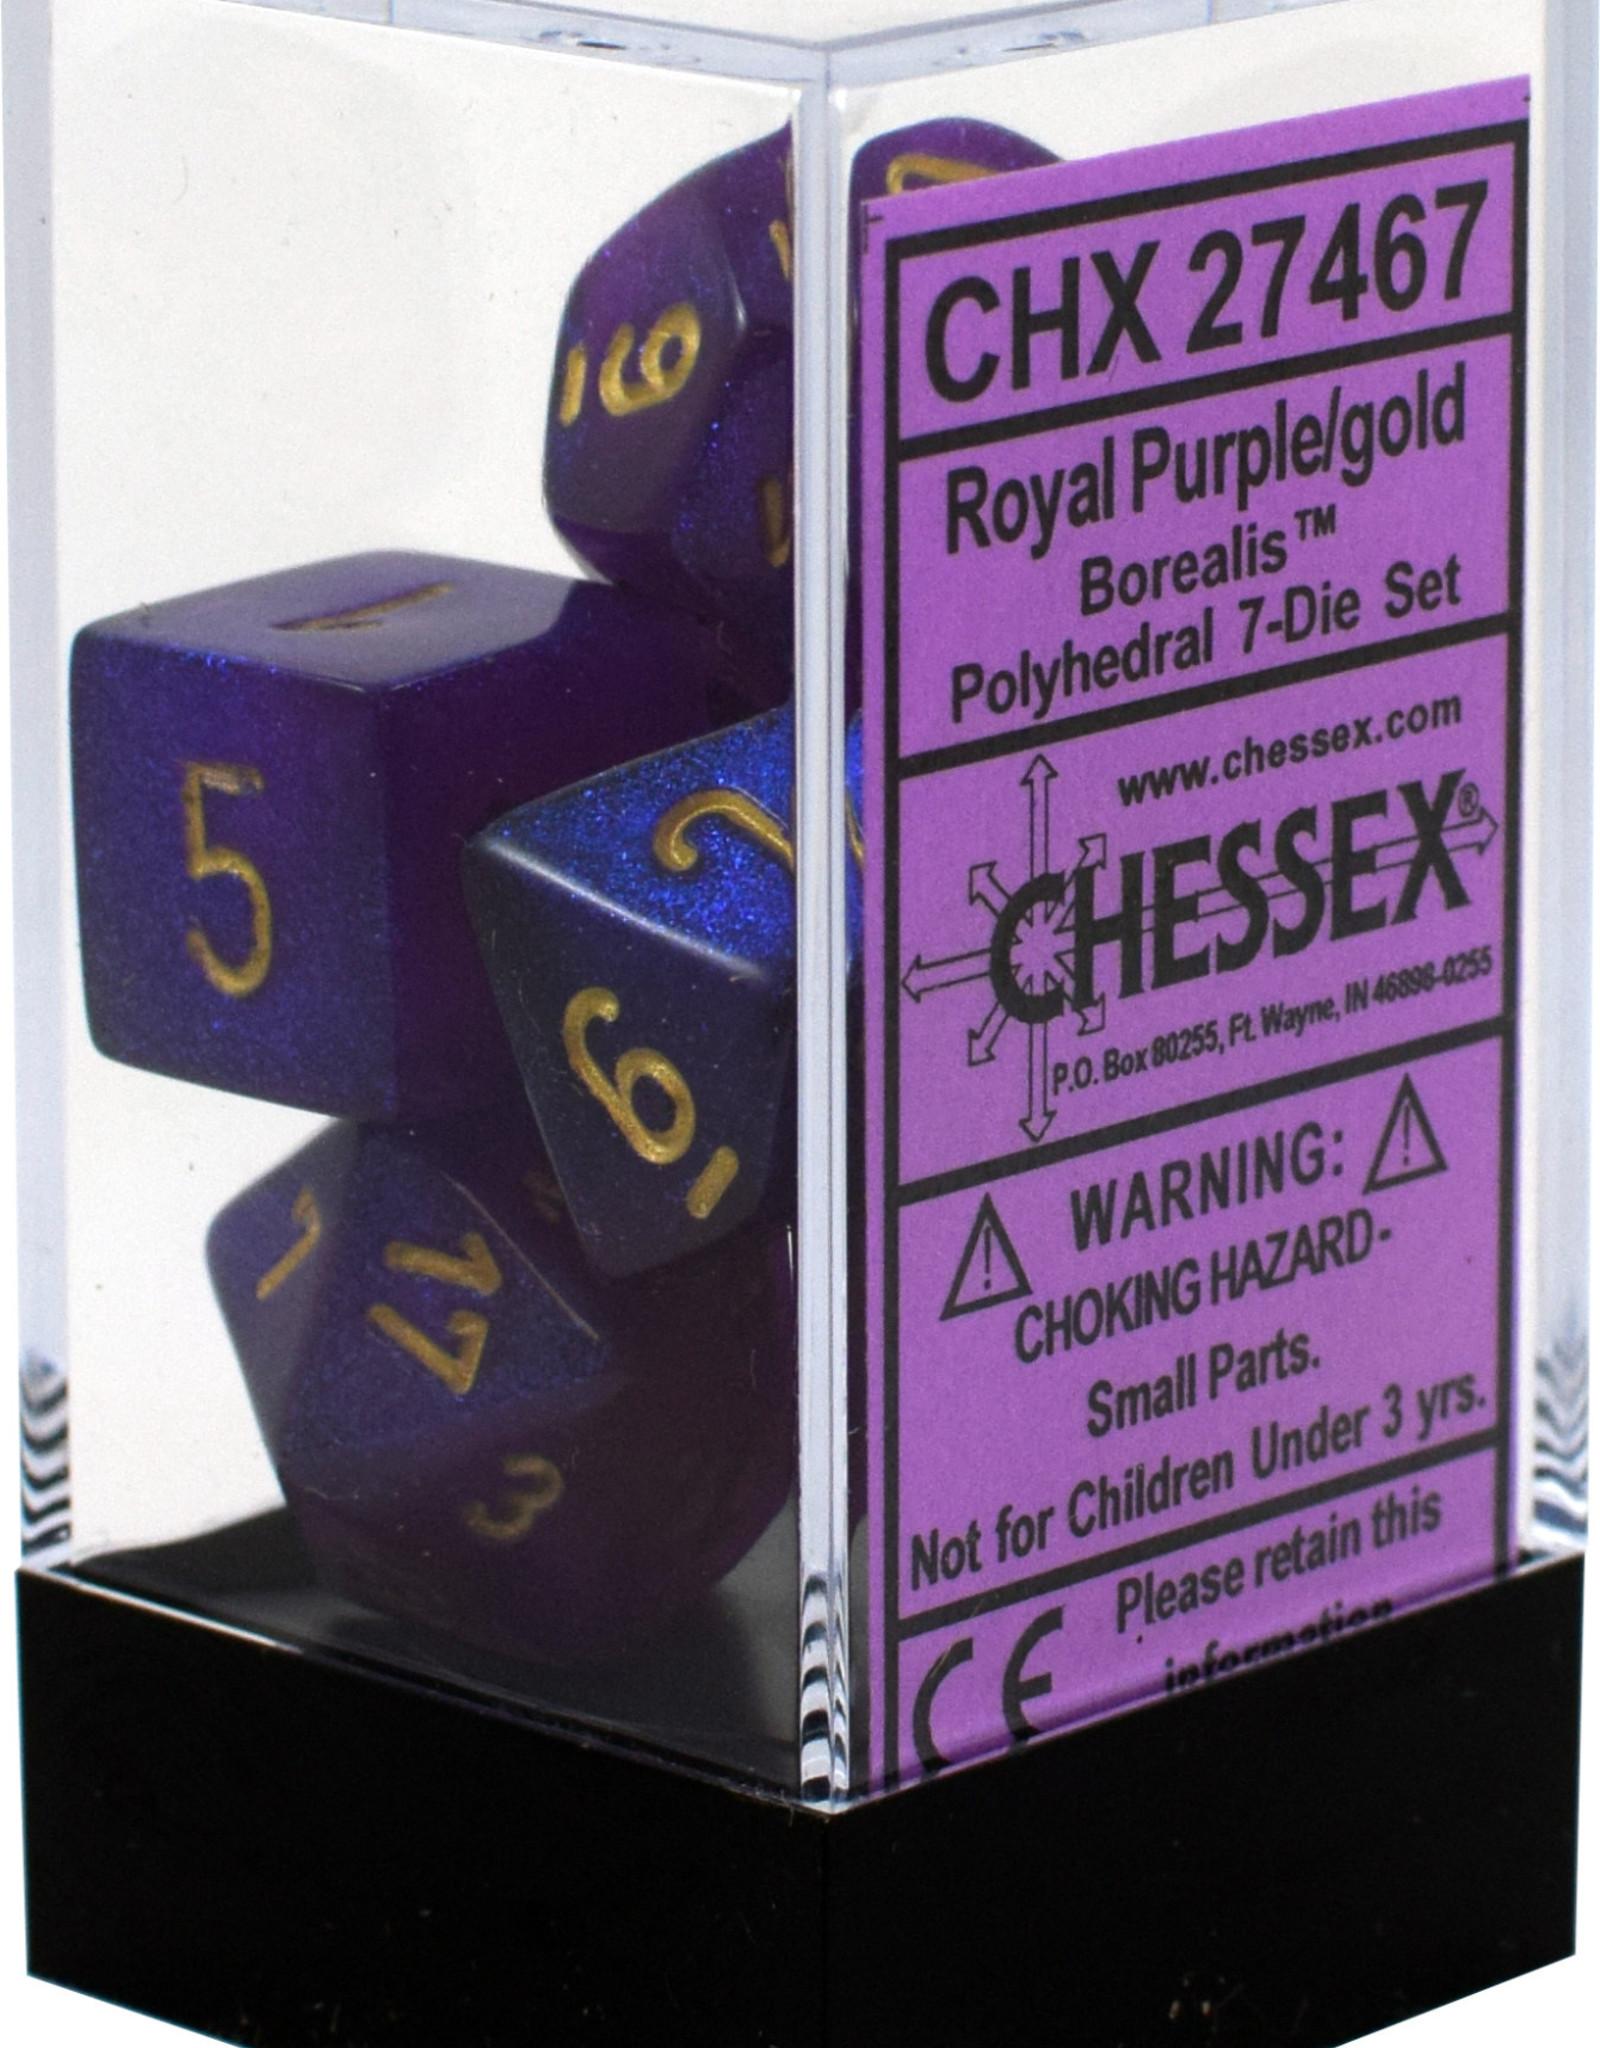 Chessex Borealis Royal Purple/gold Polyhedral Set